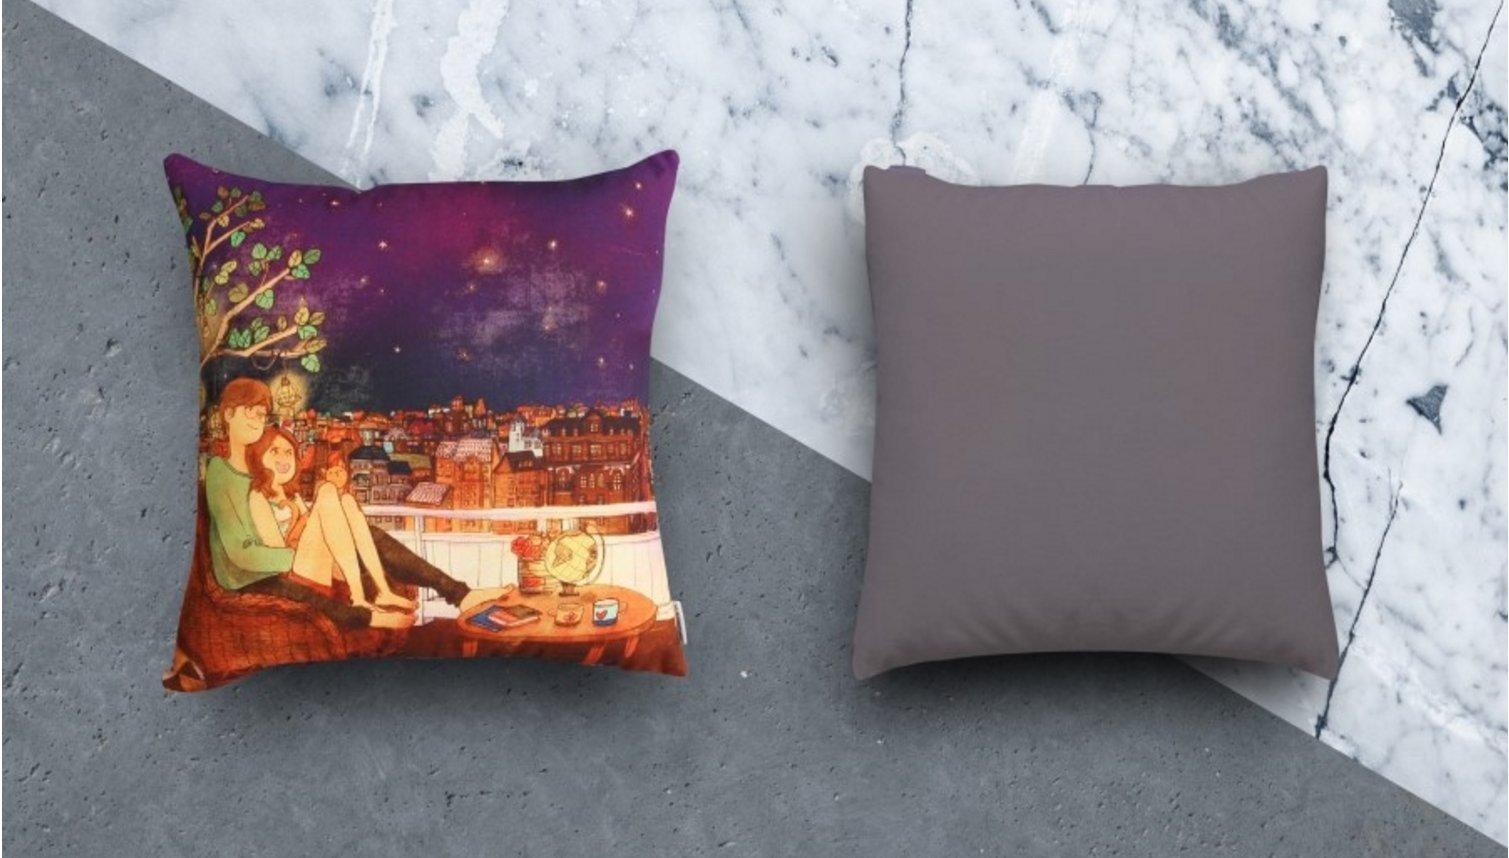 Puuung Illustration Cushion Love is Grafolio Couple Love Story Picture Present (45x45cm(17.7''x17.7'') Cushion, Stargazing)